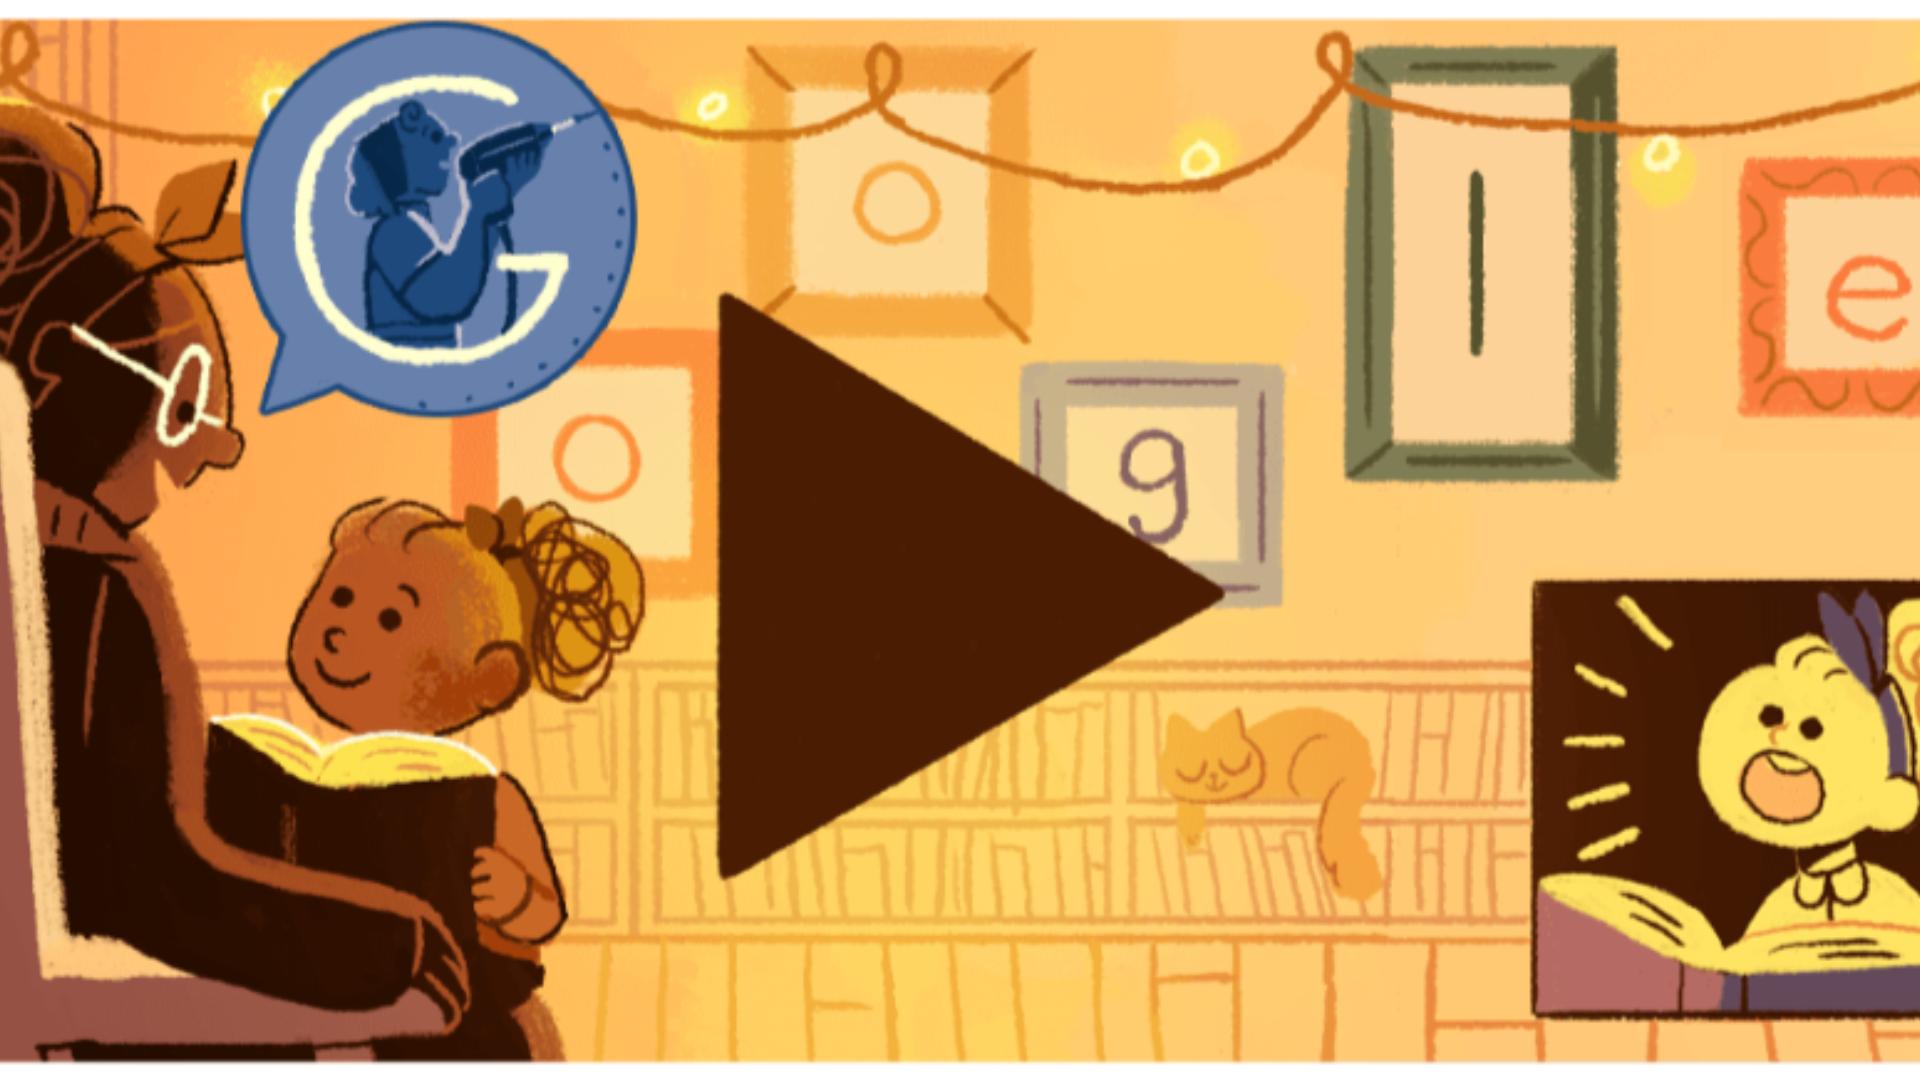 #Nexstair #International_Women's Day #Google doodle spotlights women who made their mark on history.